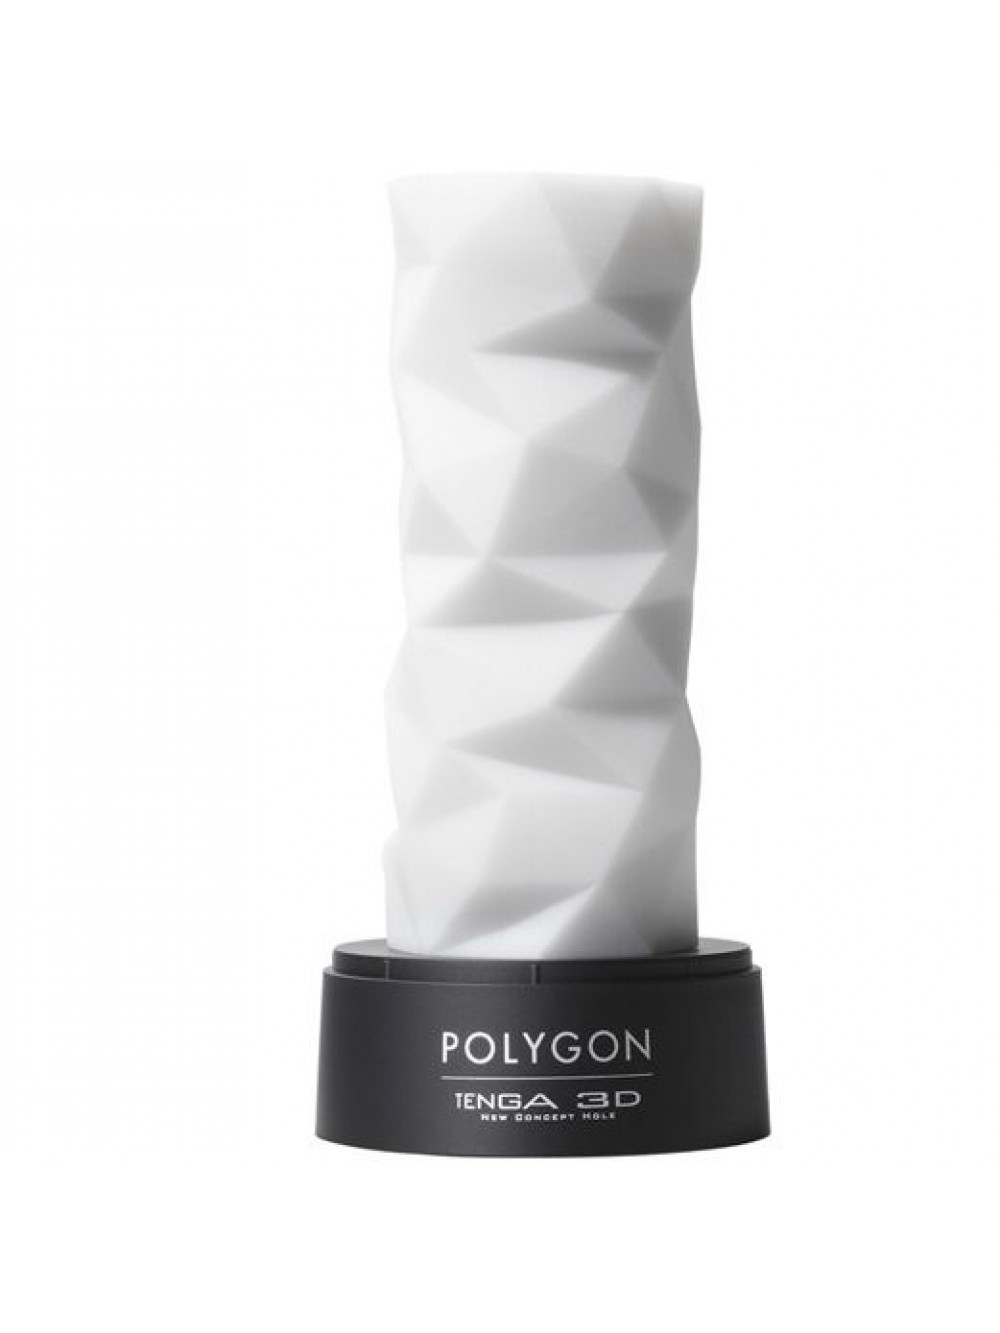 TENGA 3D POLYGON SCULPTED ECSTASY 4560220551400